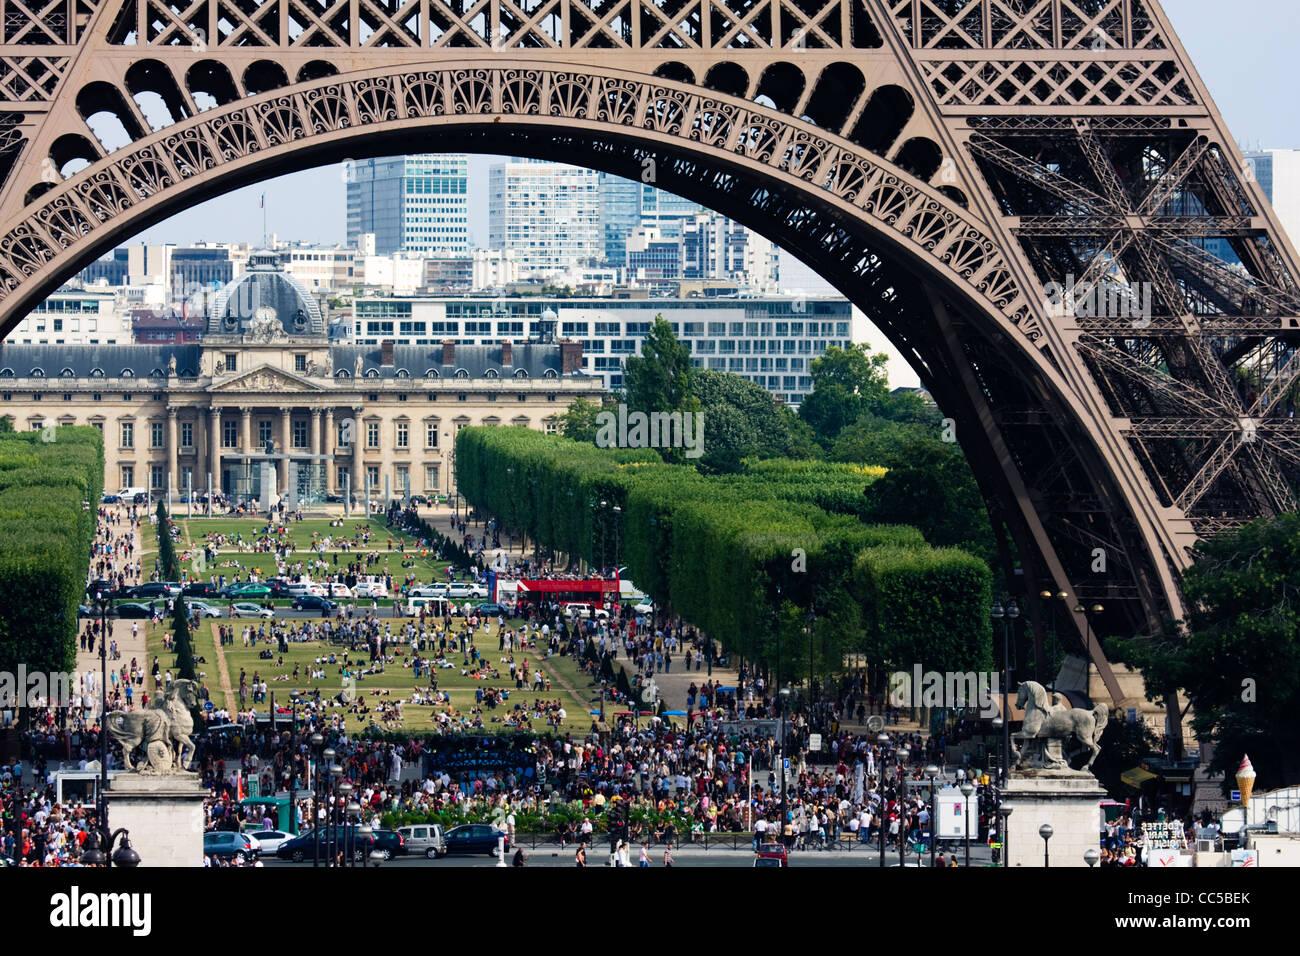 Crowds under Eiffel Tower and on Champ de Mars, Paris, France. - Stock Image